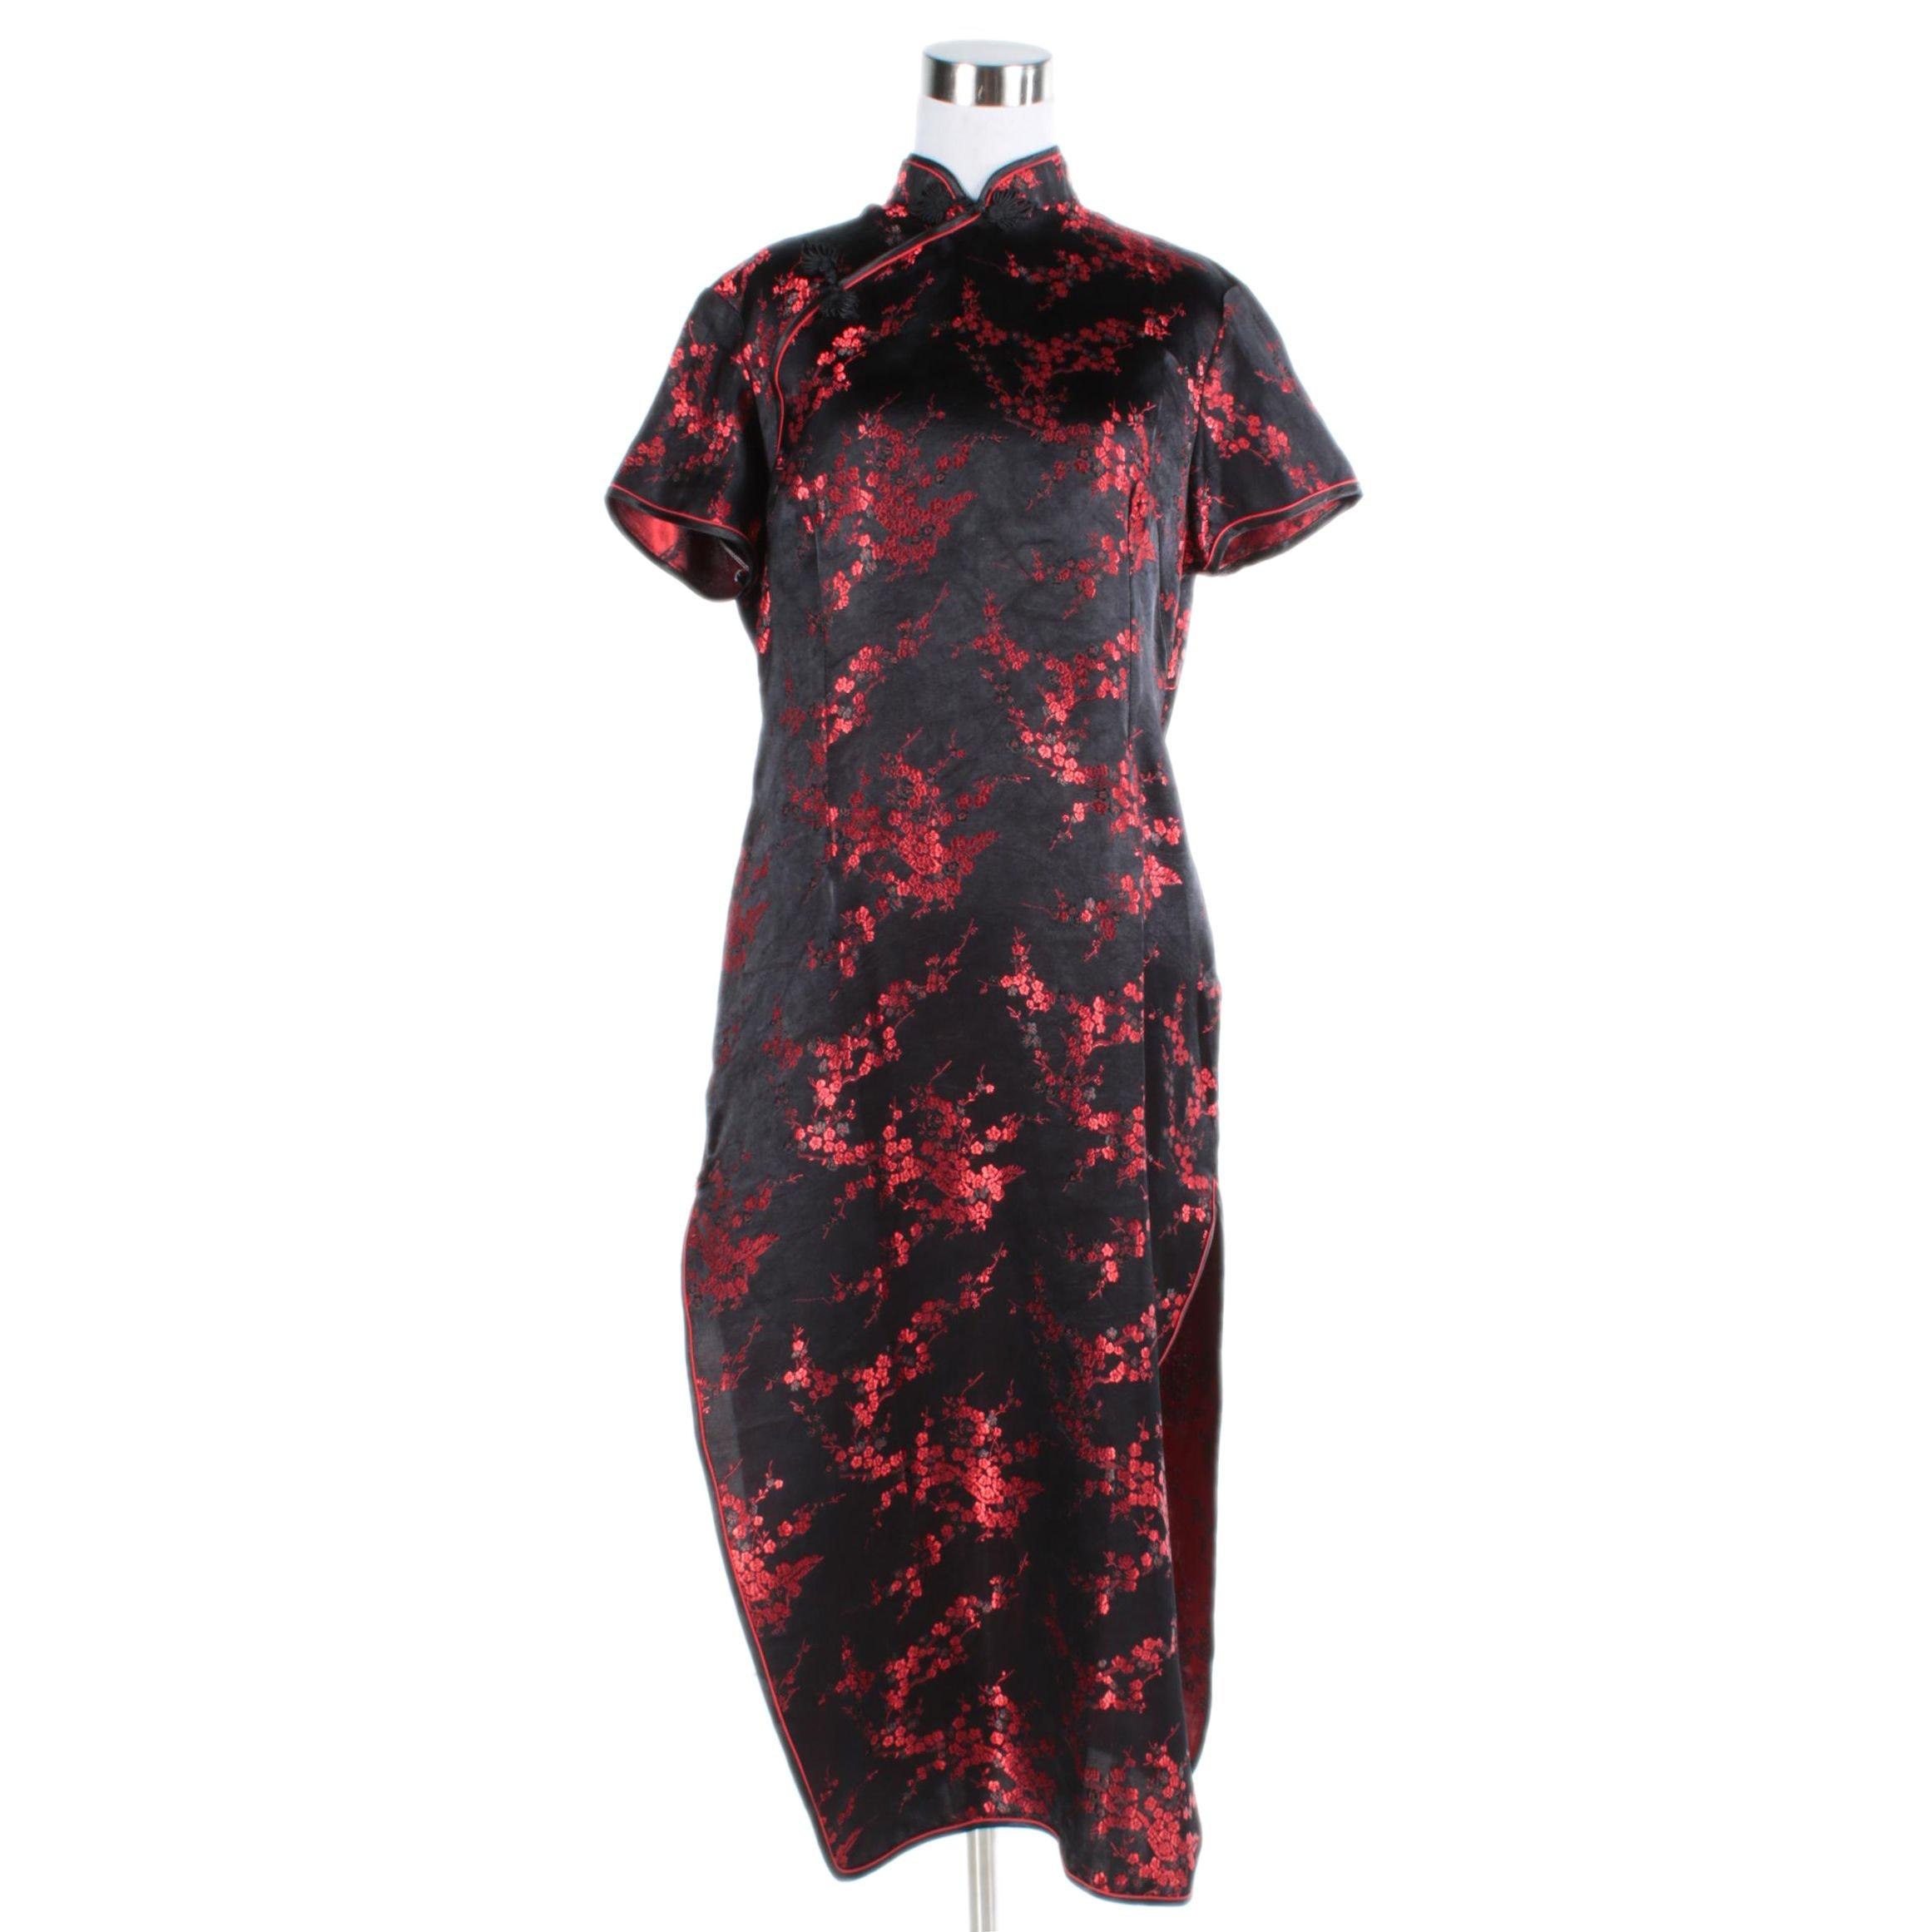 Women's Black and Red Silk Brocade Cheongsam Dress